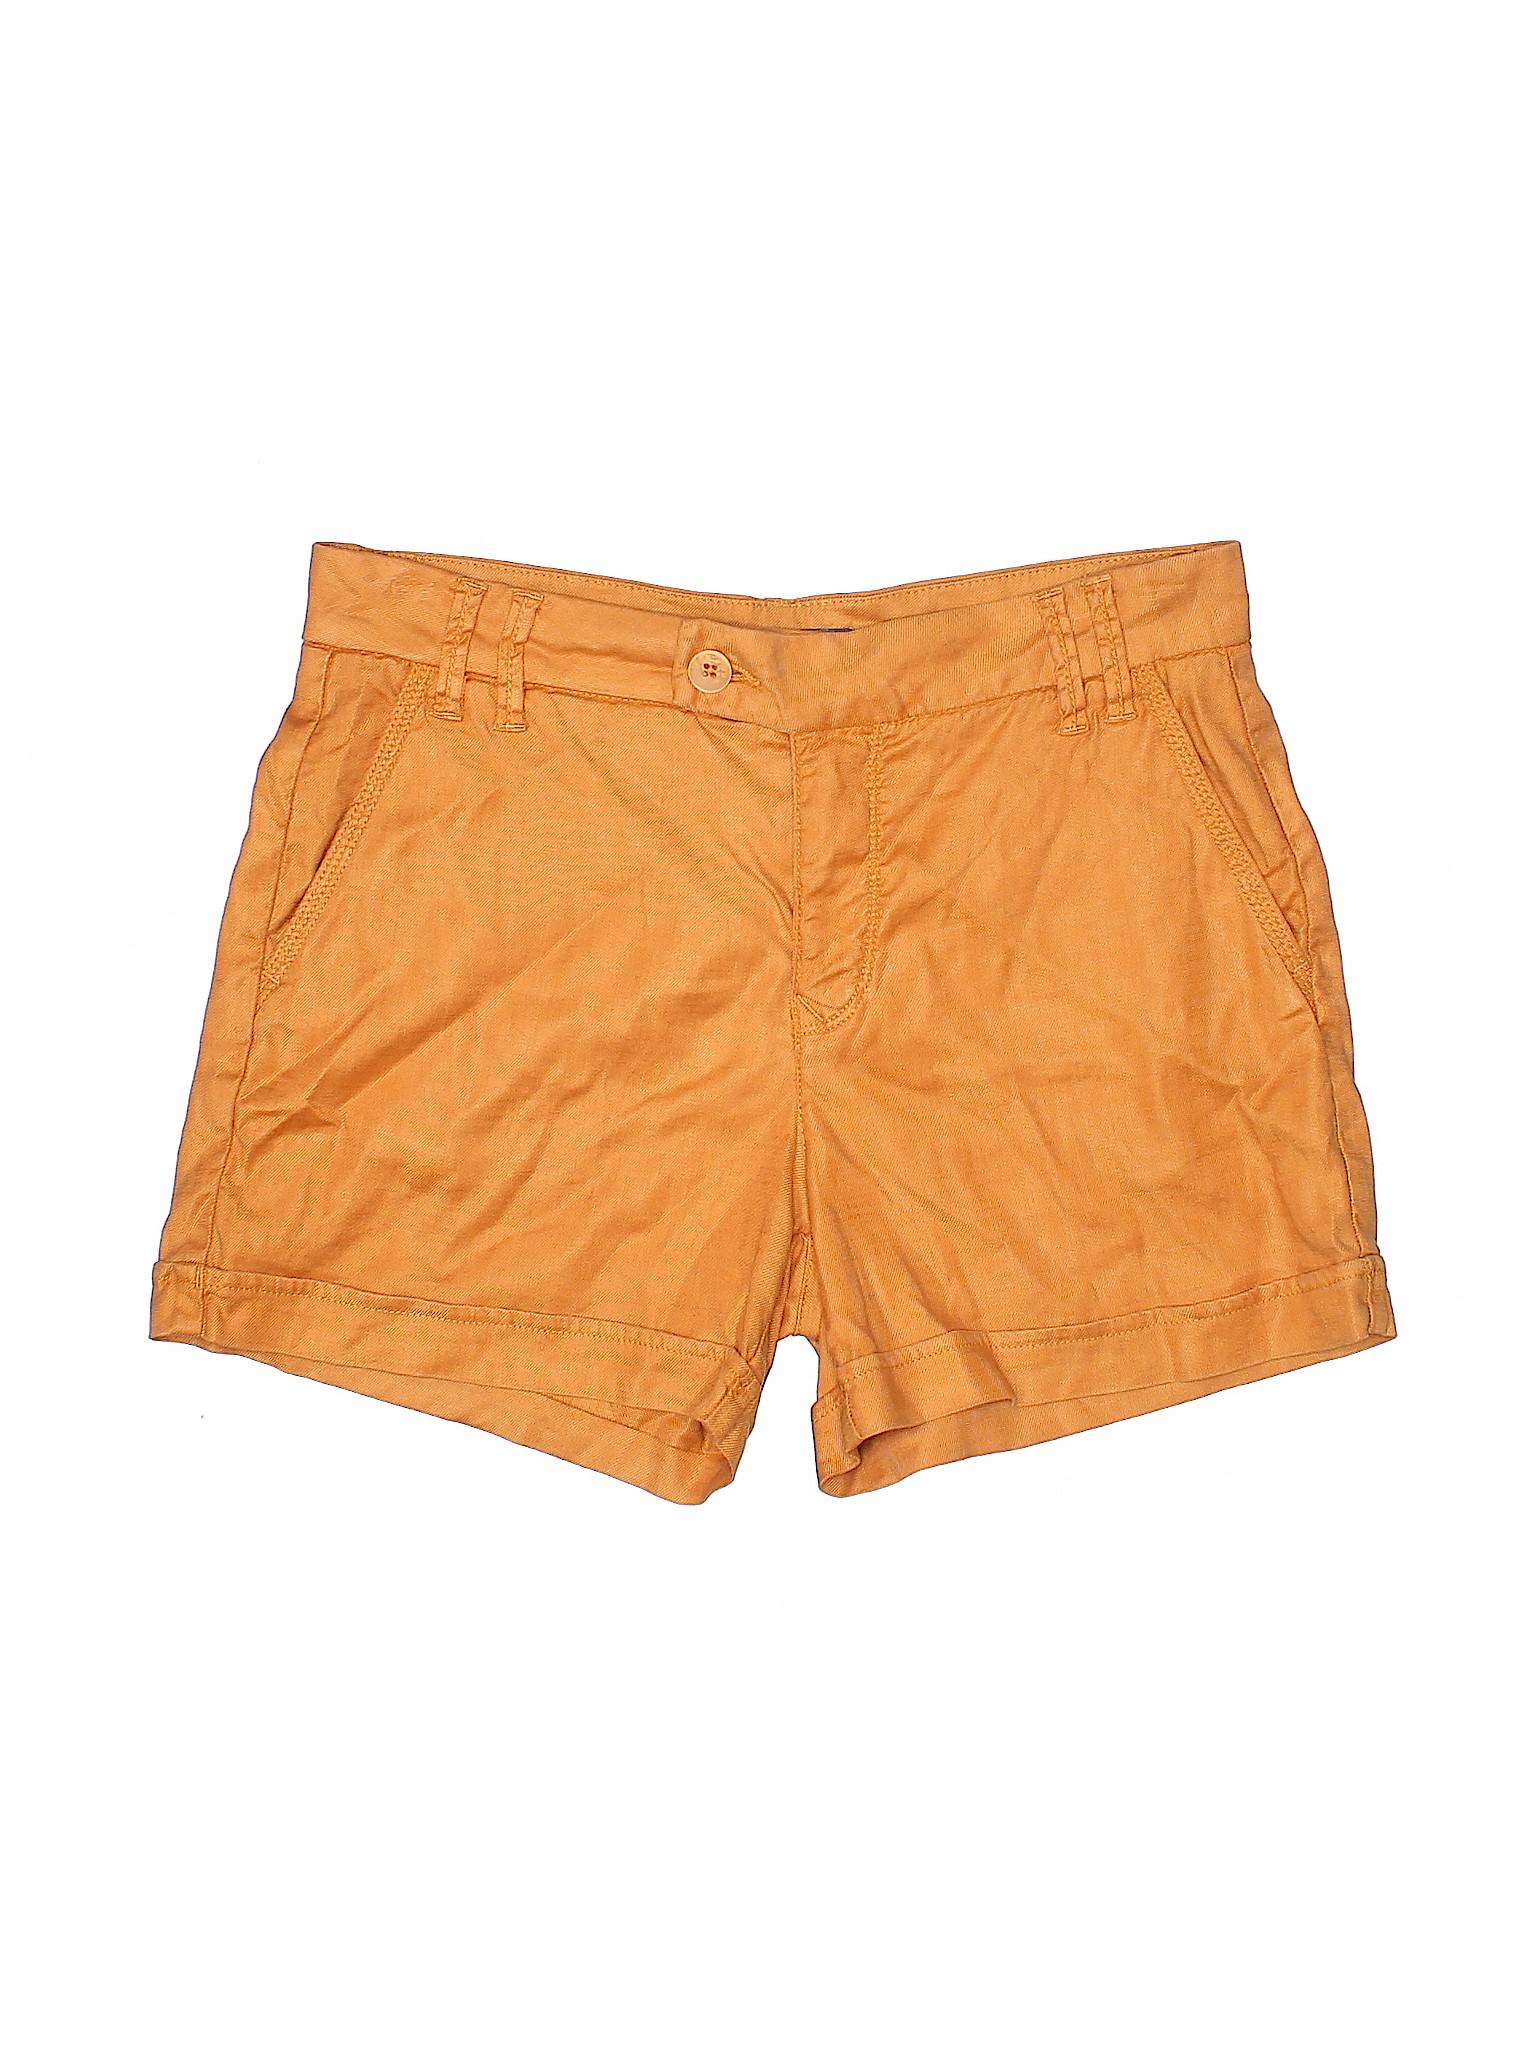 Shorts Level Level Level Level Boutique 99 Boutique Shorts Shorts 99 Shorts 99 Boutique 99 Boutique AzF6Uxz